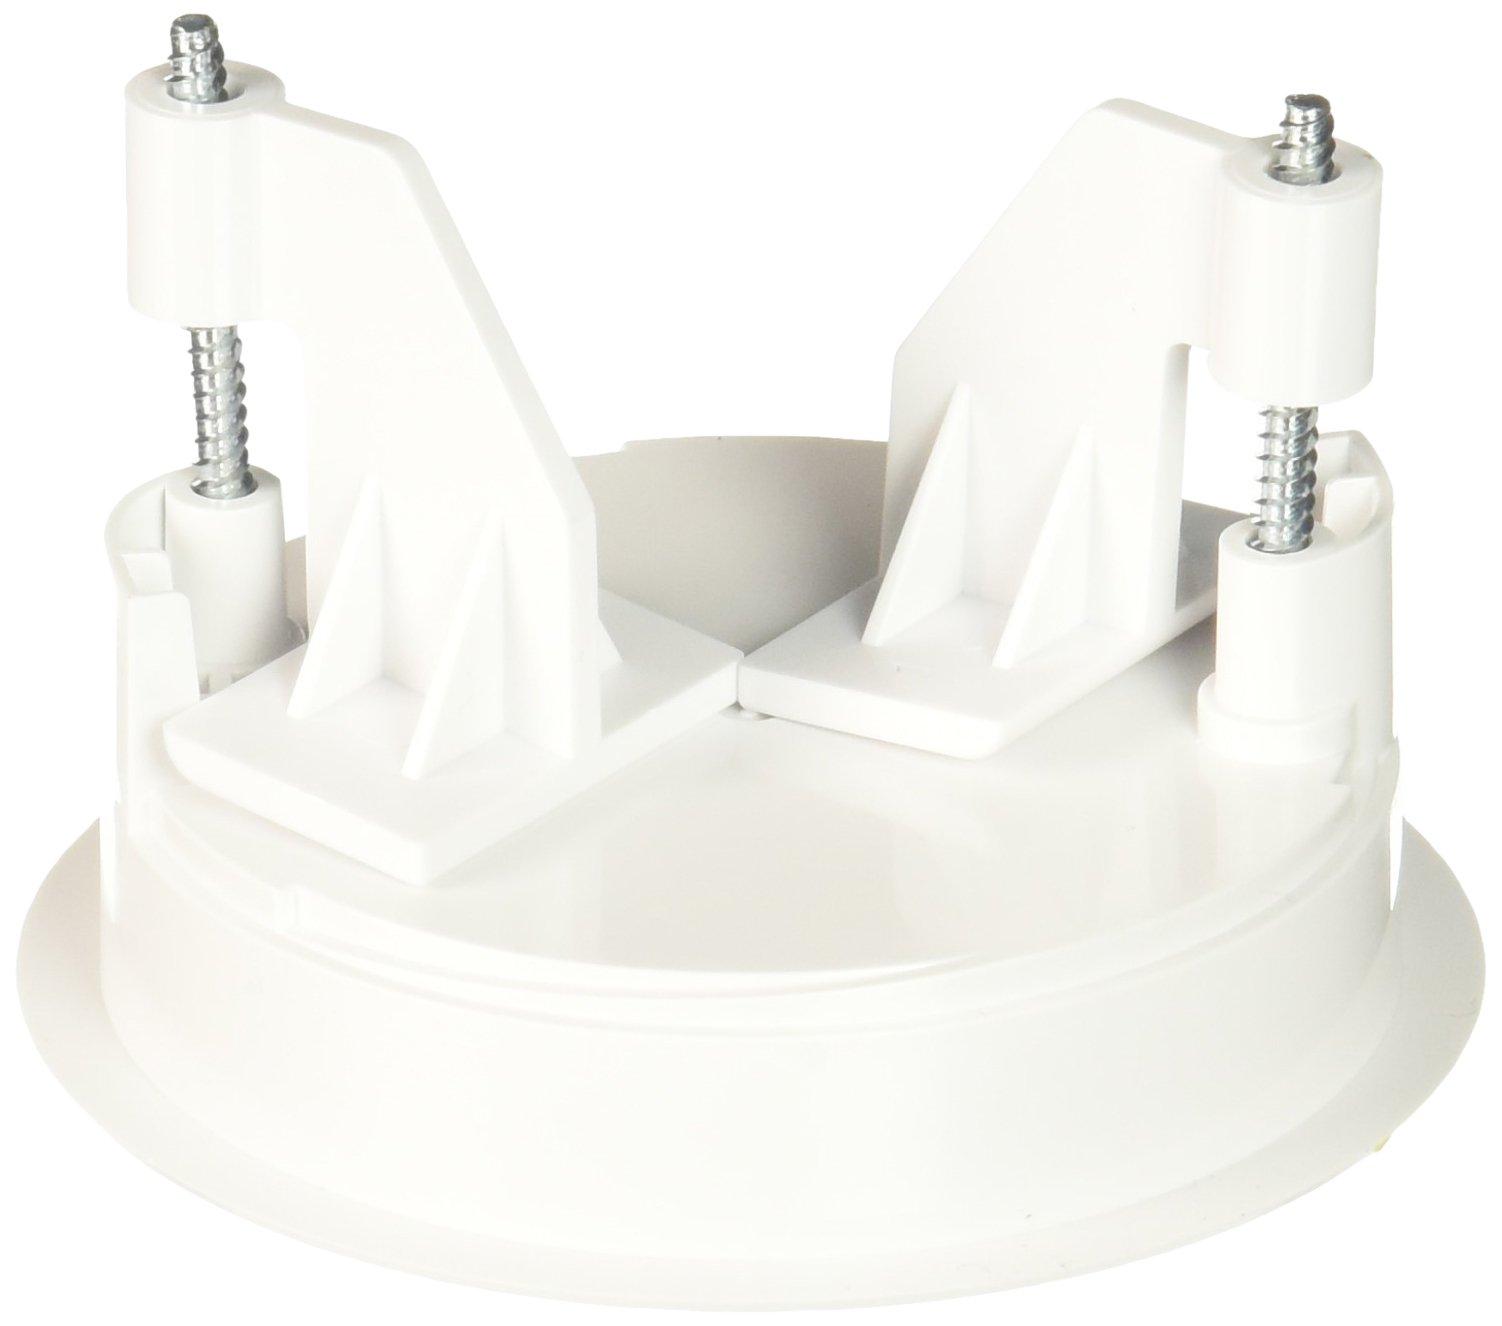 Lutron L-CRMK-WH Recess Mounting Bracket for Radio Power Saver Wireless Ceiling Mounted Sensors, White